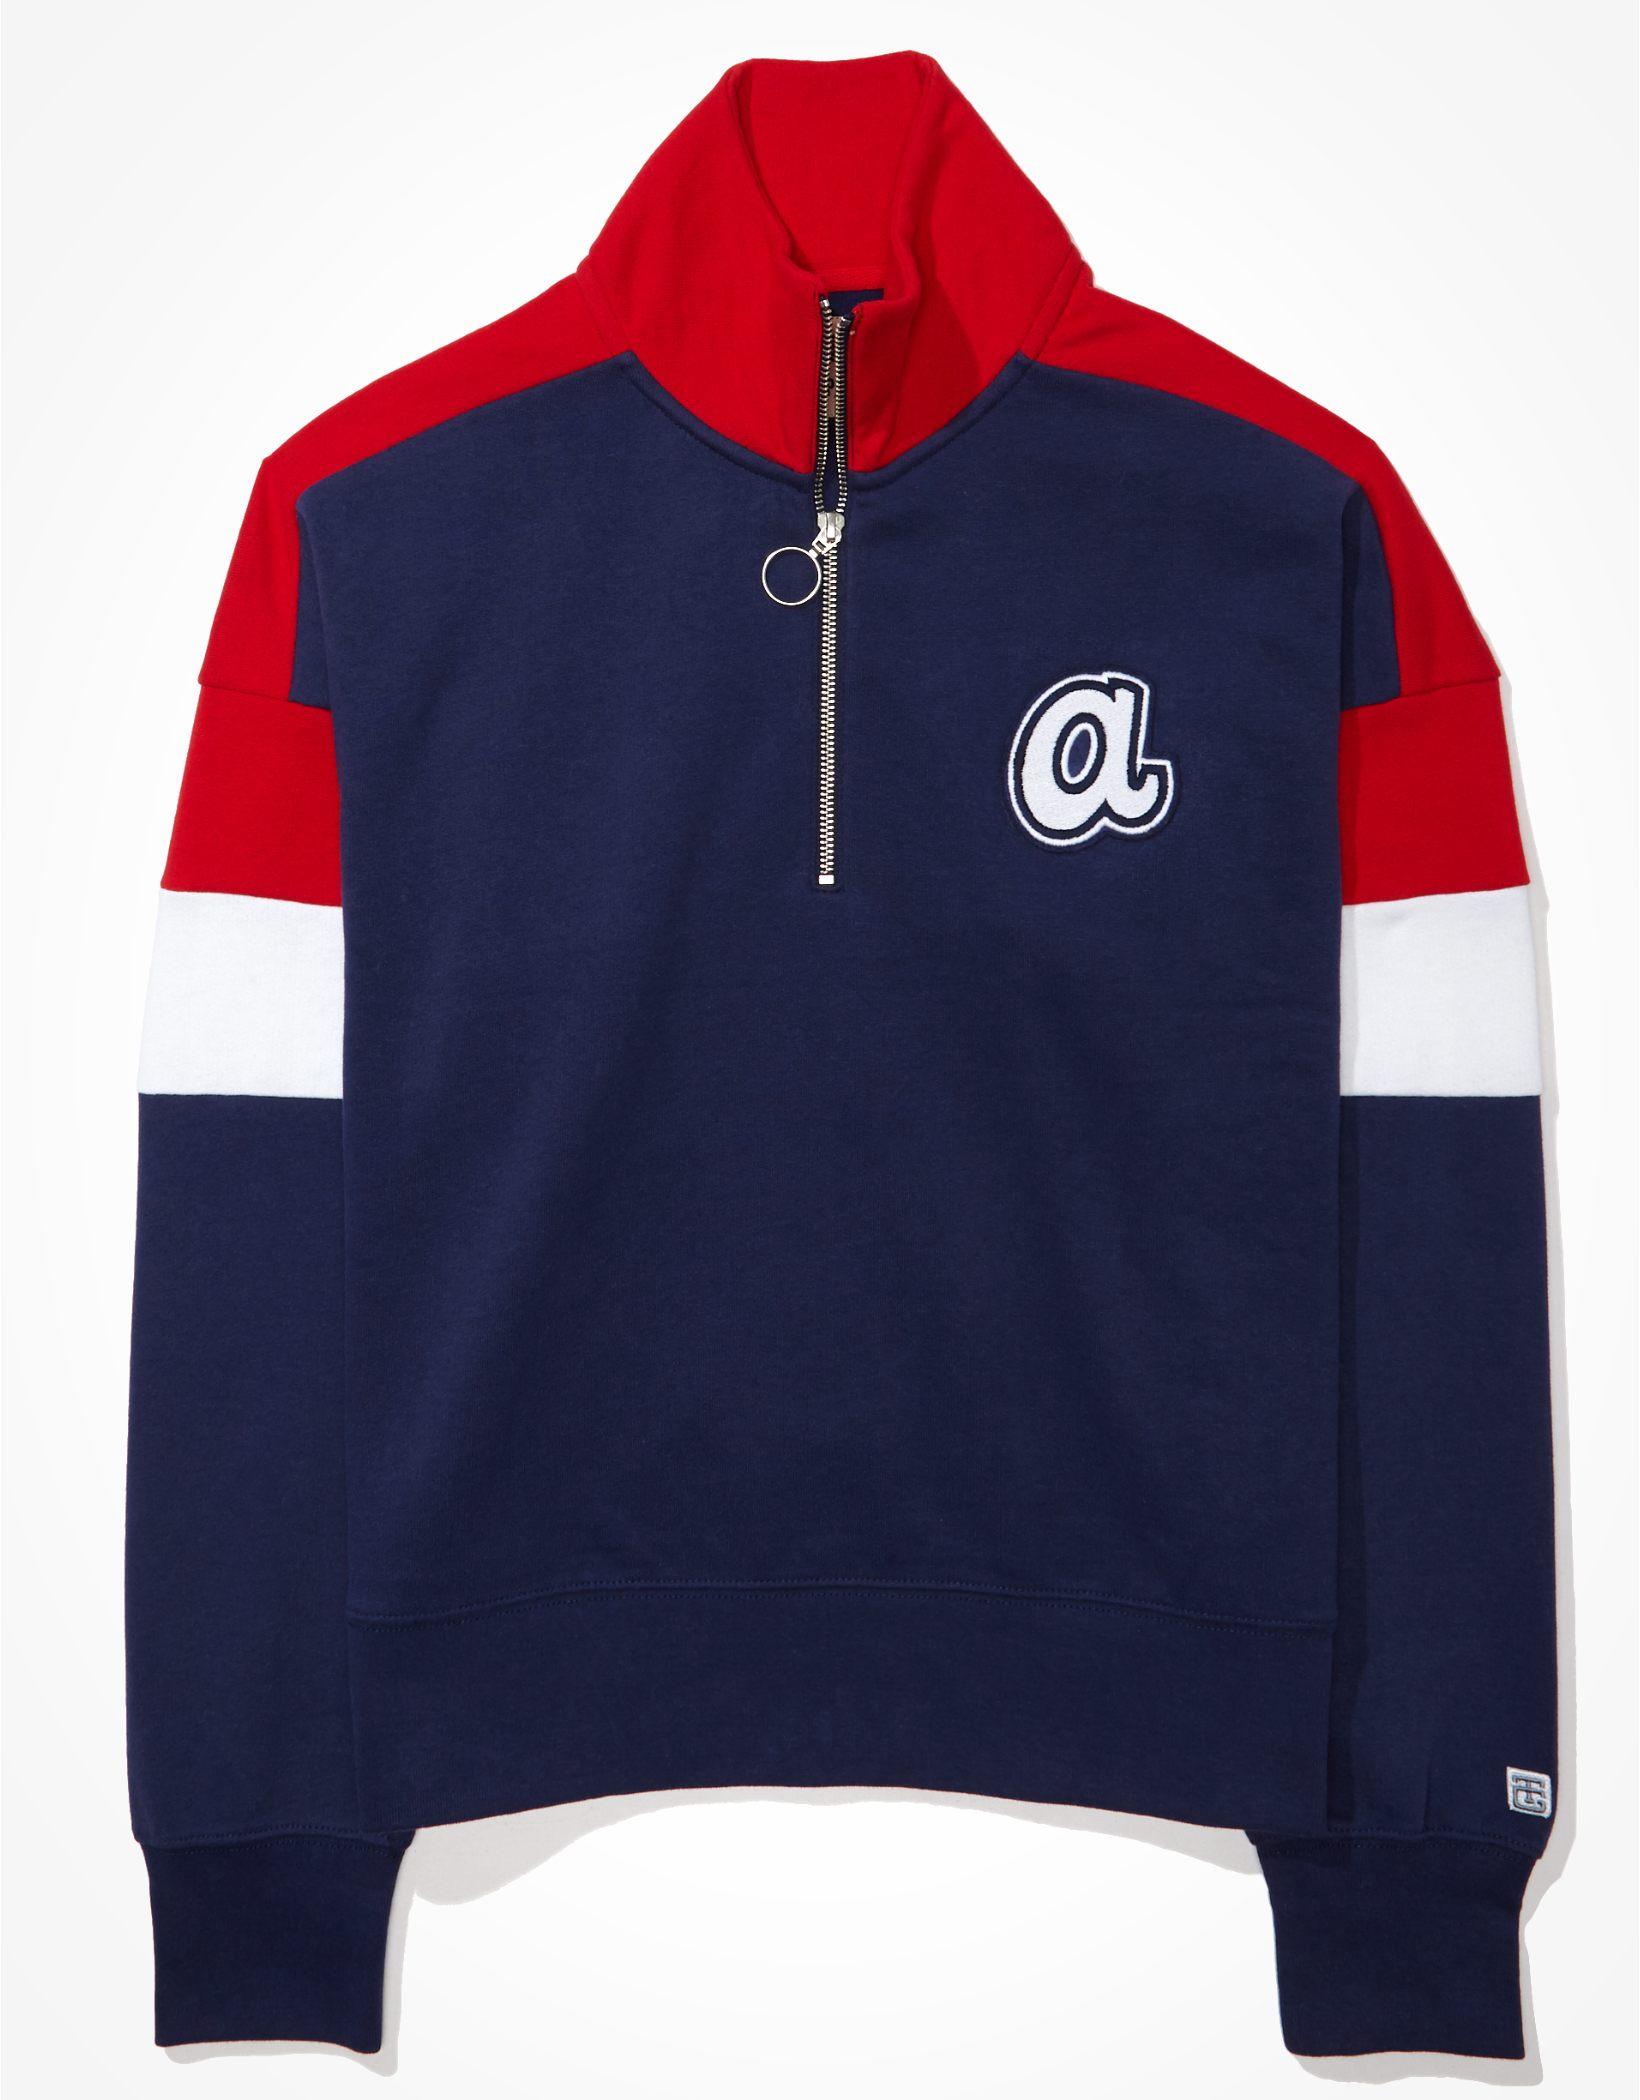 Tailgate Women's Atlanta Braves Colorblock 1/4 Zip Sweatshirt